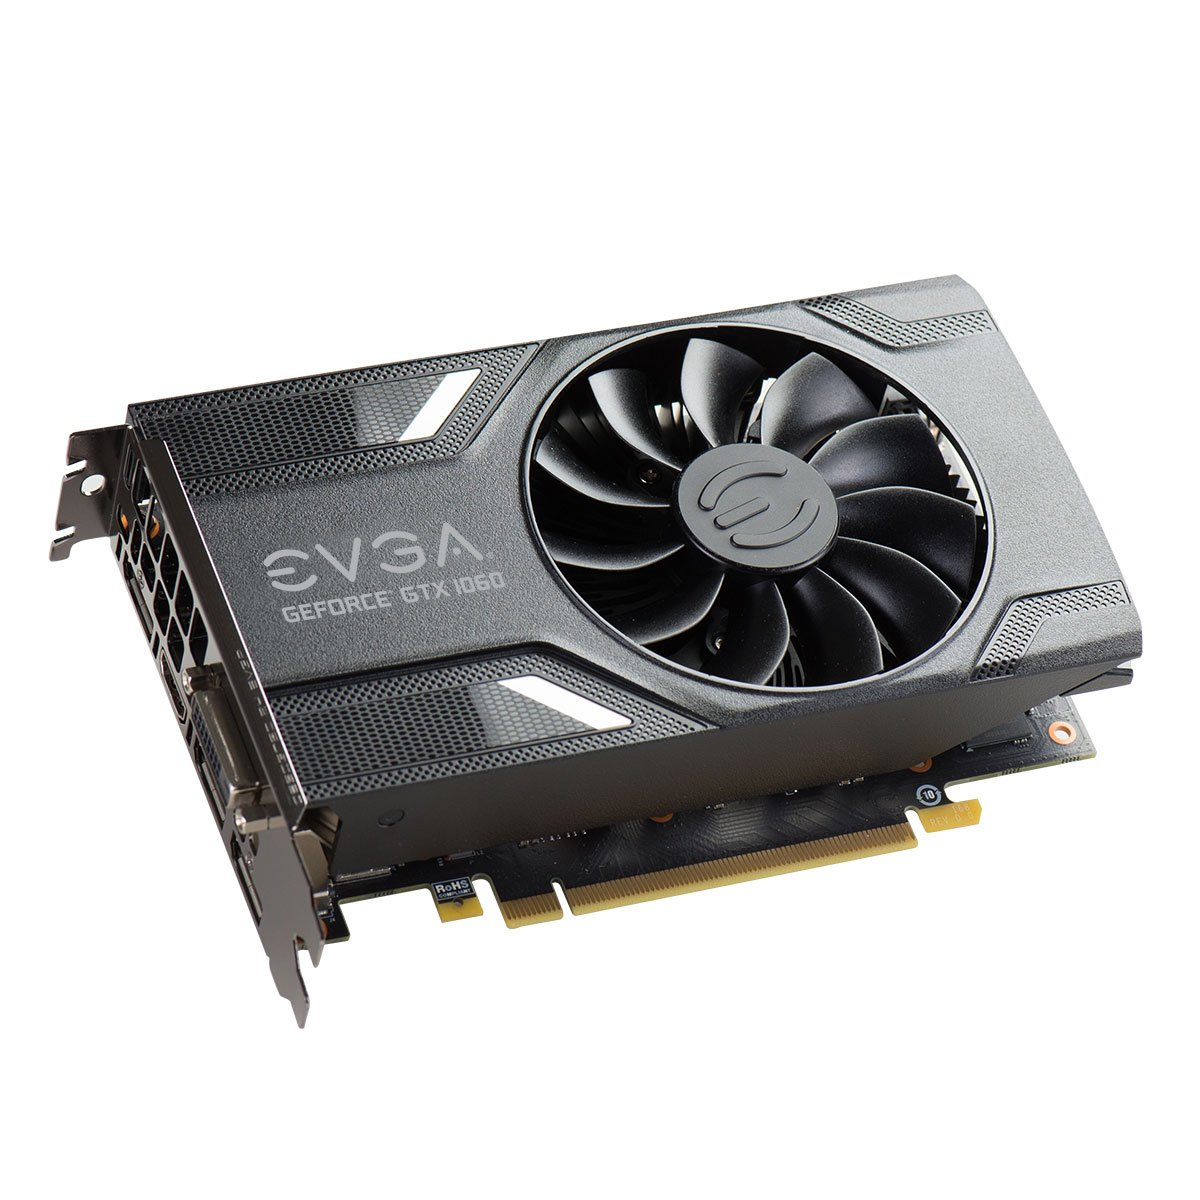 EVGA 06G-P4-6161-KR - Tarjeta gráfica (GeForce GTX 1060, 6 GB, GDDR5, 192 bit, 7680 x 4320 Pixeles, PCI Express x16 3.0): Amazon.es: Informática